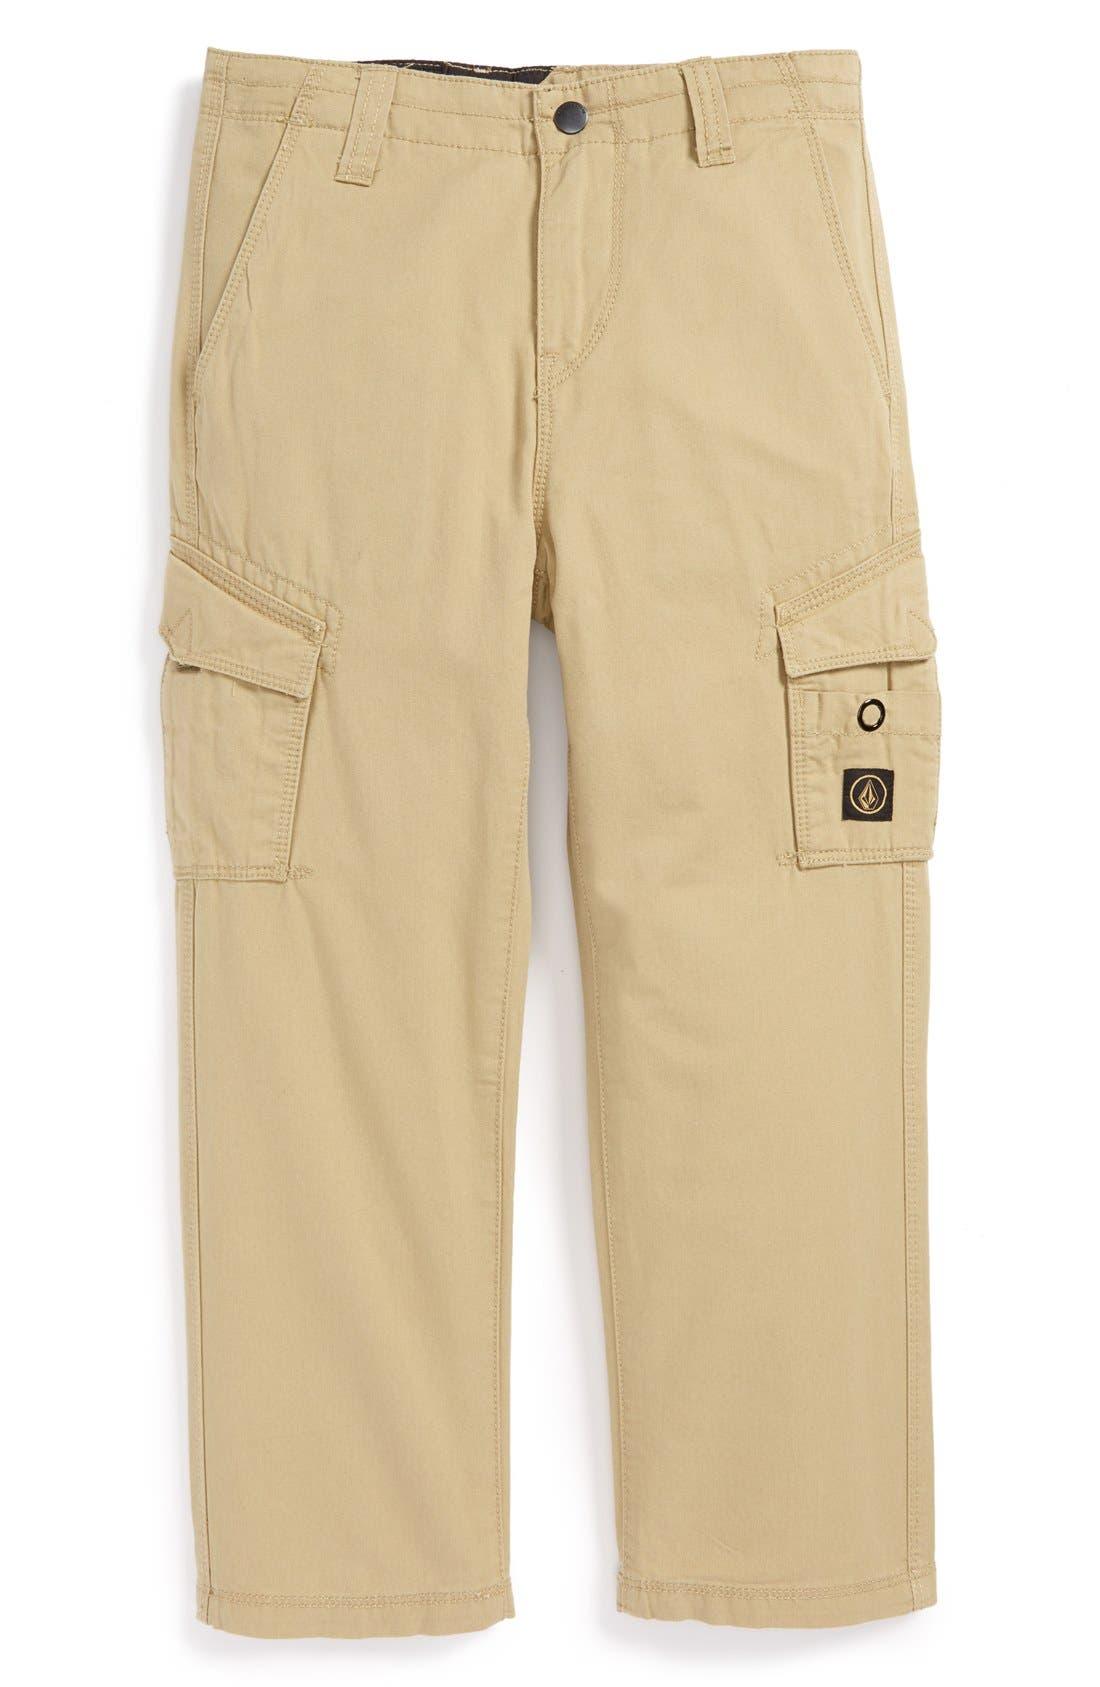 Alternate Image 1 Selected - Volcom 'Mesa' Cargo Pants (Big Boys)